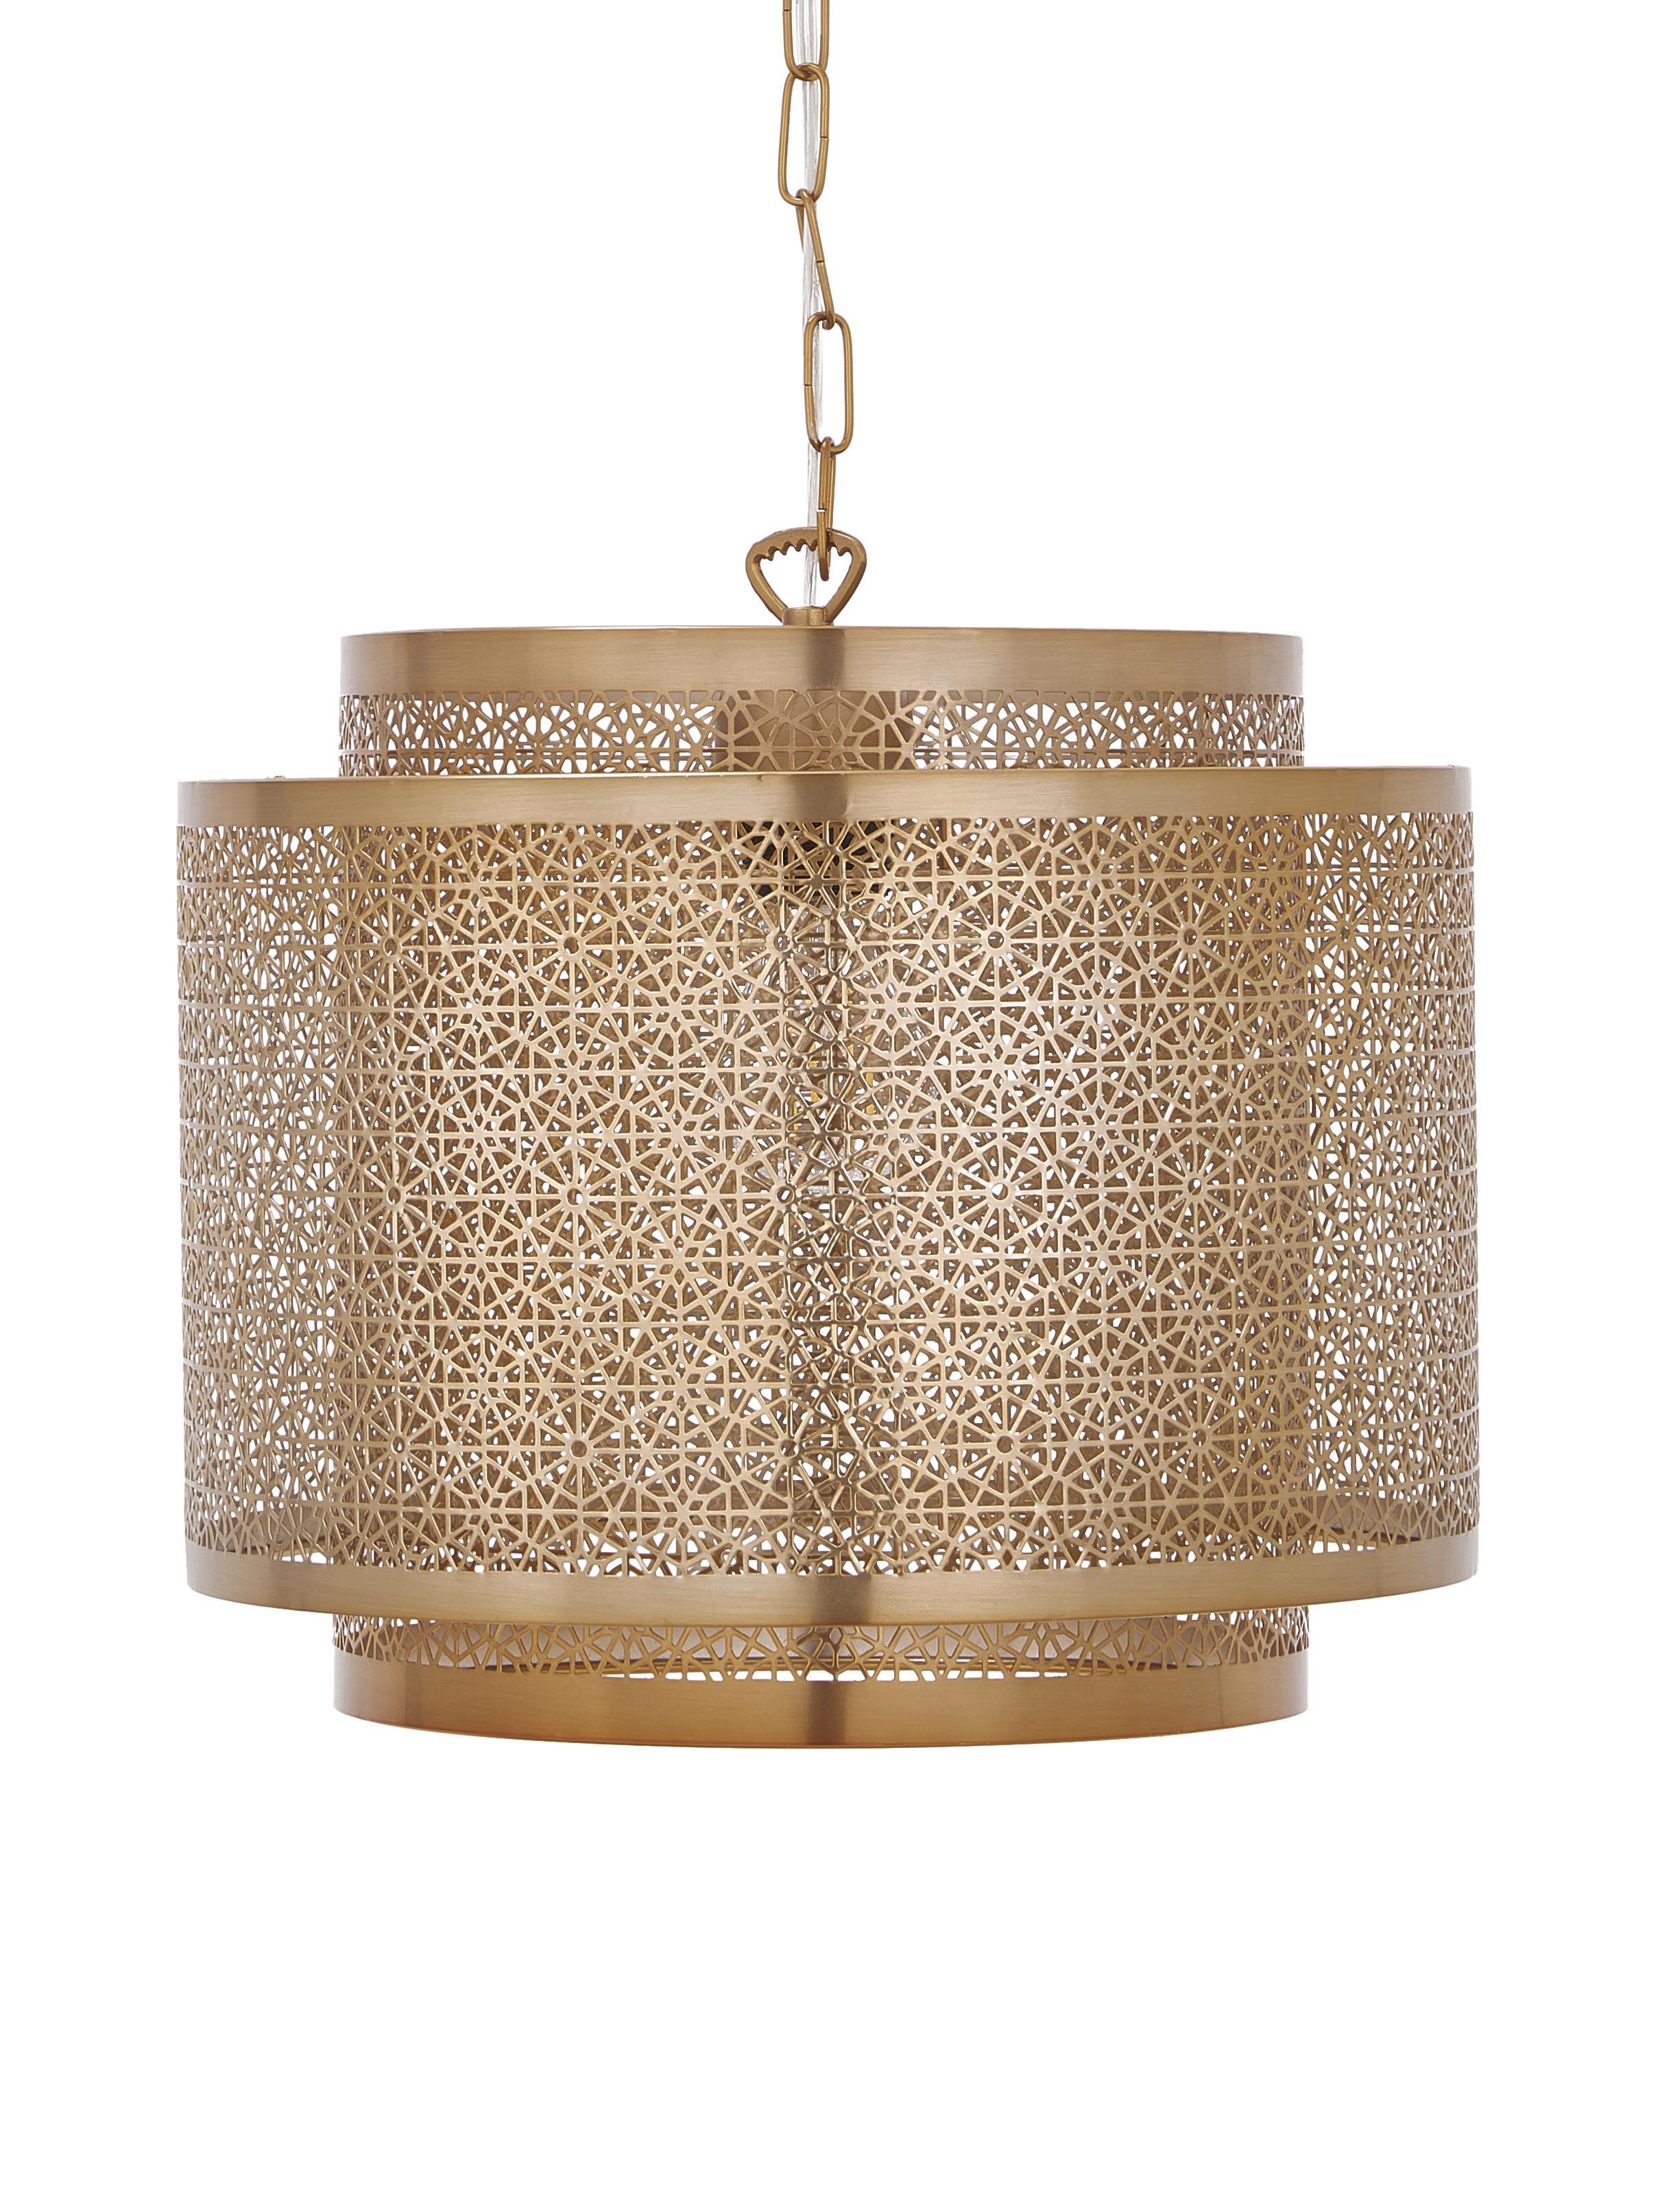 Boho hanglamp Hermine, messing, Messing, Mat messingkleurig, Ø 35 x H 28 cm